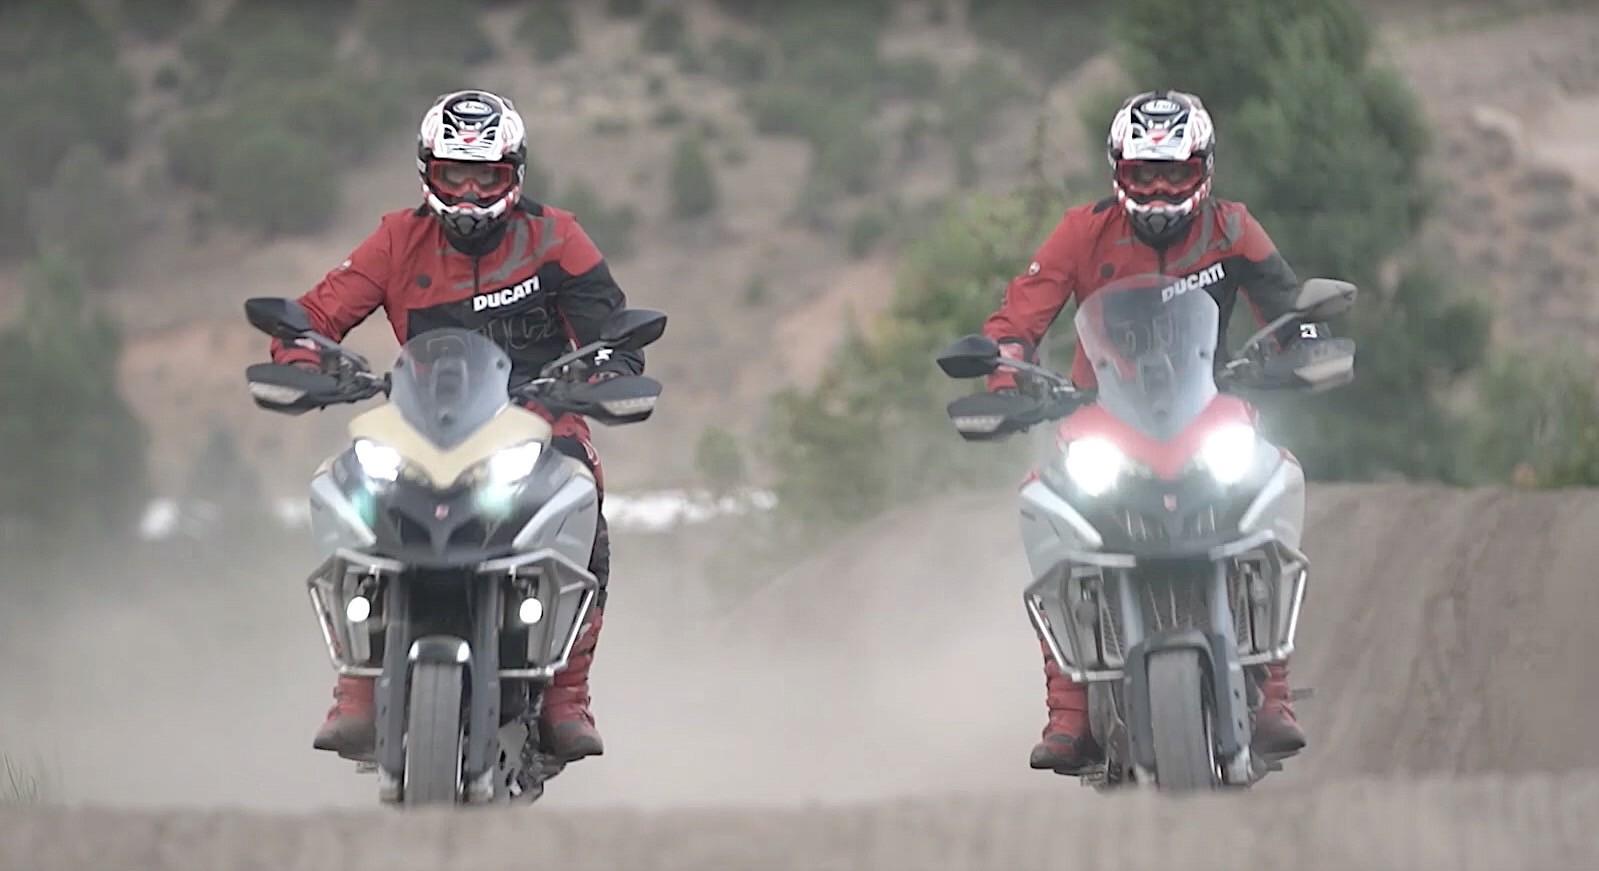 ebbb3cbc Now, This Is One Unhappy Ducati Hypermotard Customer - autoevolution